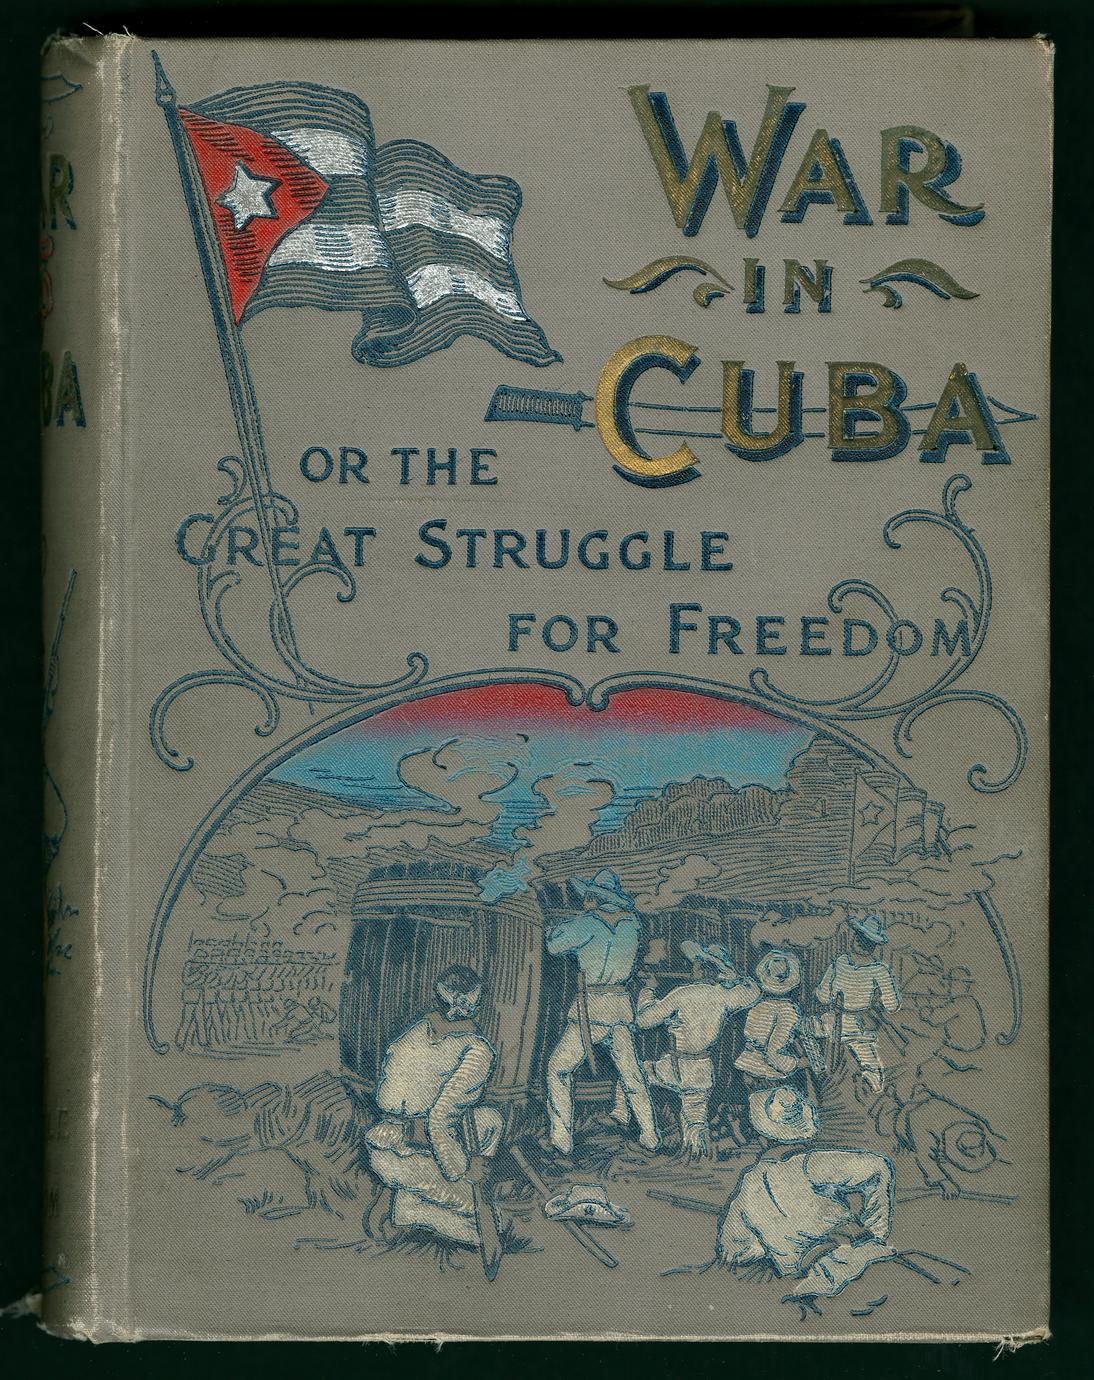 The war in Cuba (1 of 3)